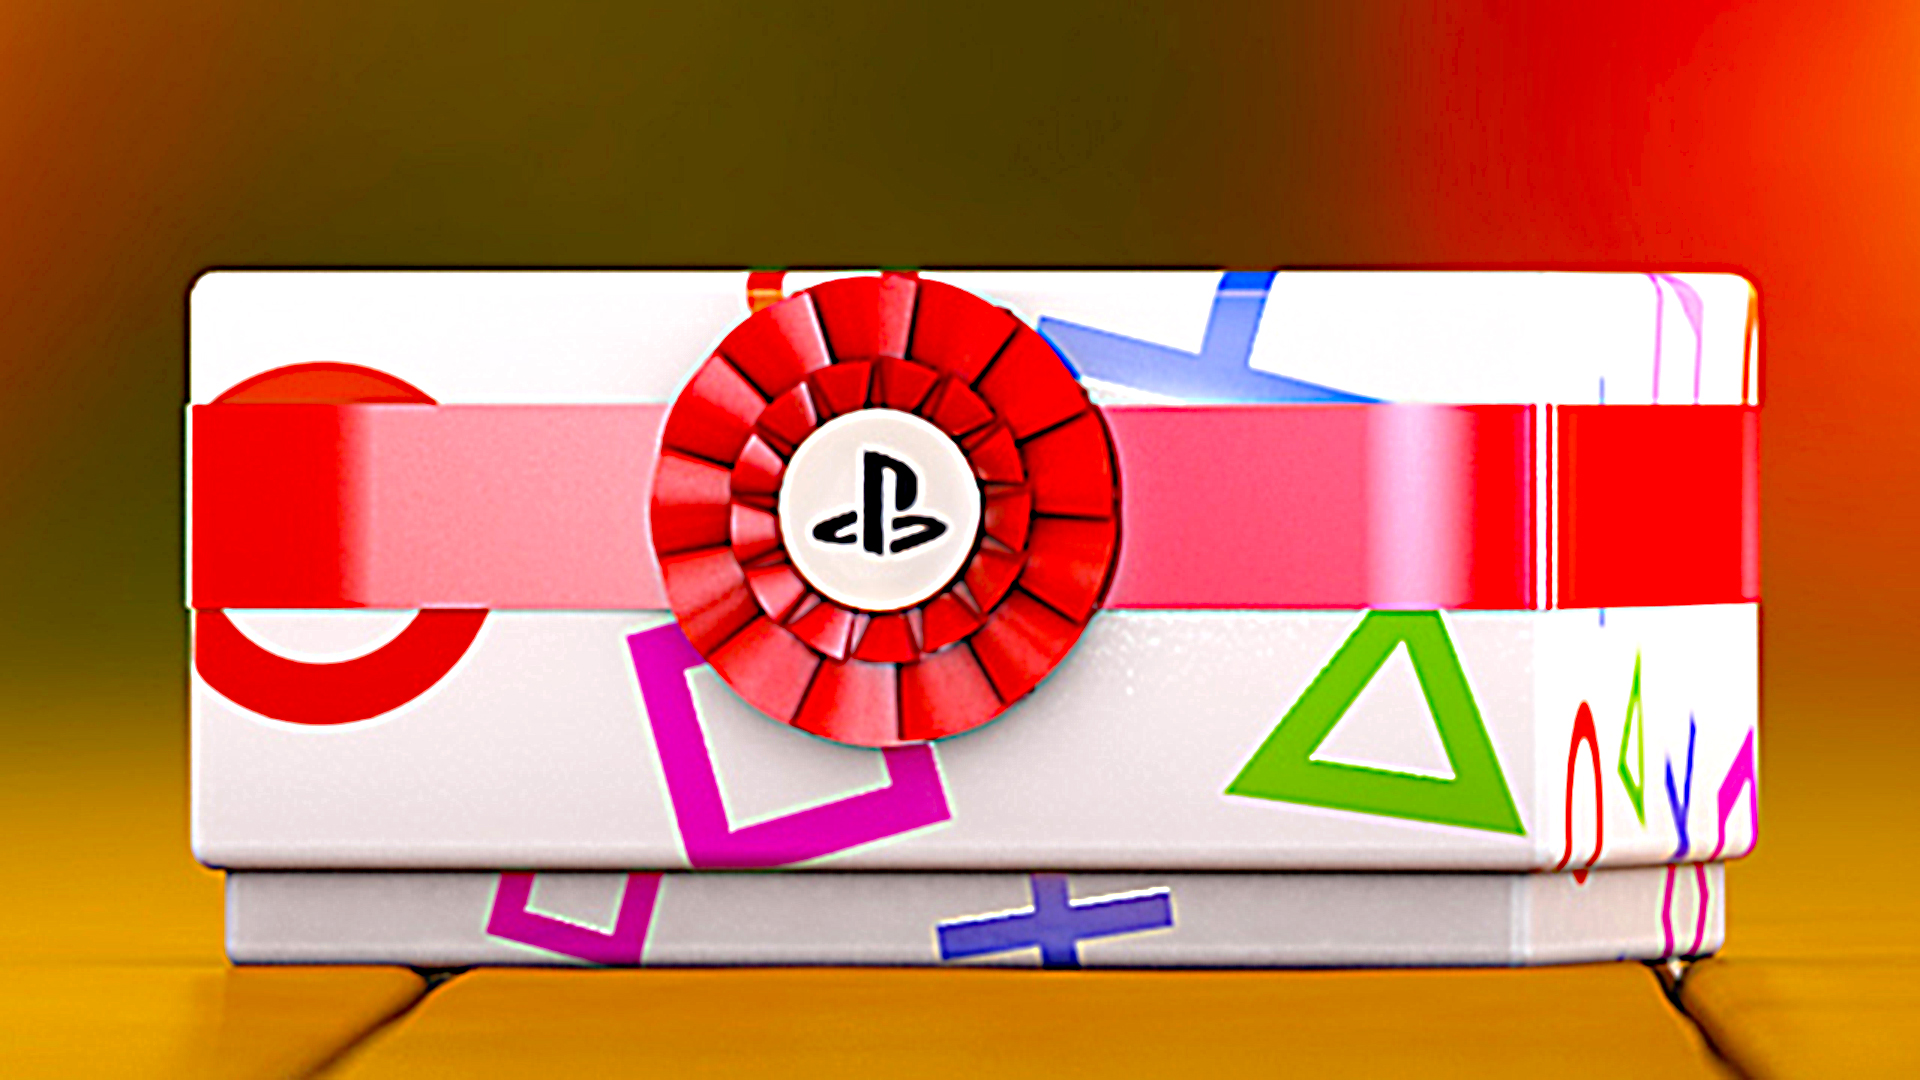 News – Tornano le 12 offerte di Natale targate Playstation!